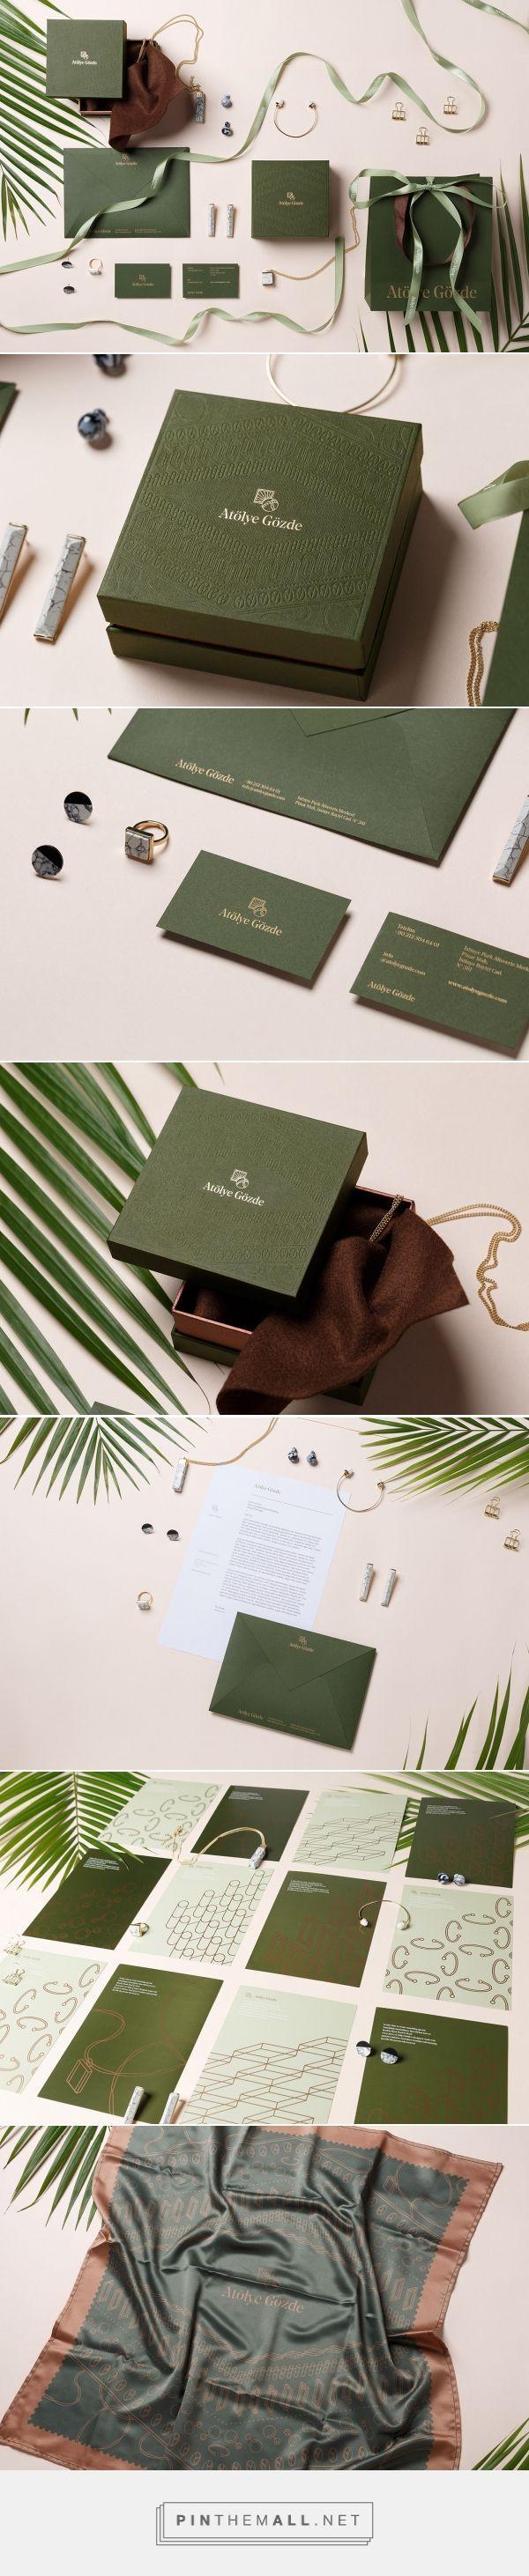 Branding, fashion and packaging for Atolye Gozde Branding on Behance by Frames http://ecommerce.jrstudioweb.com/